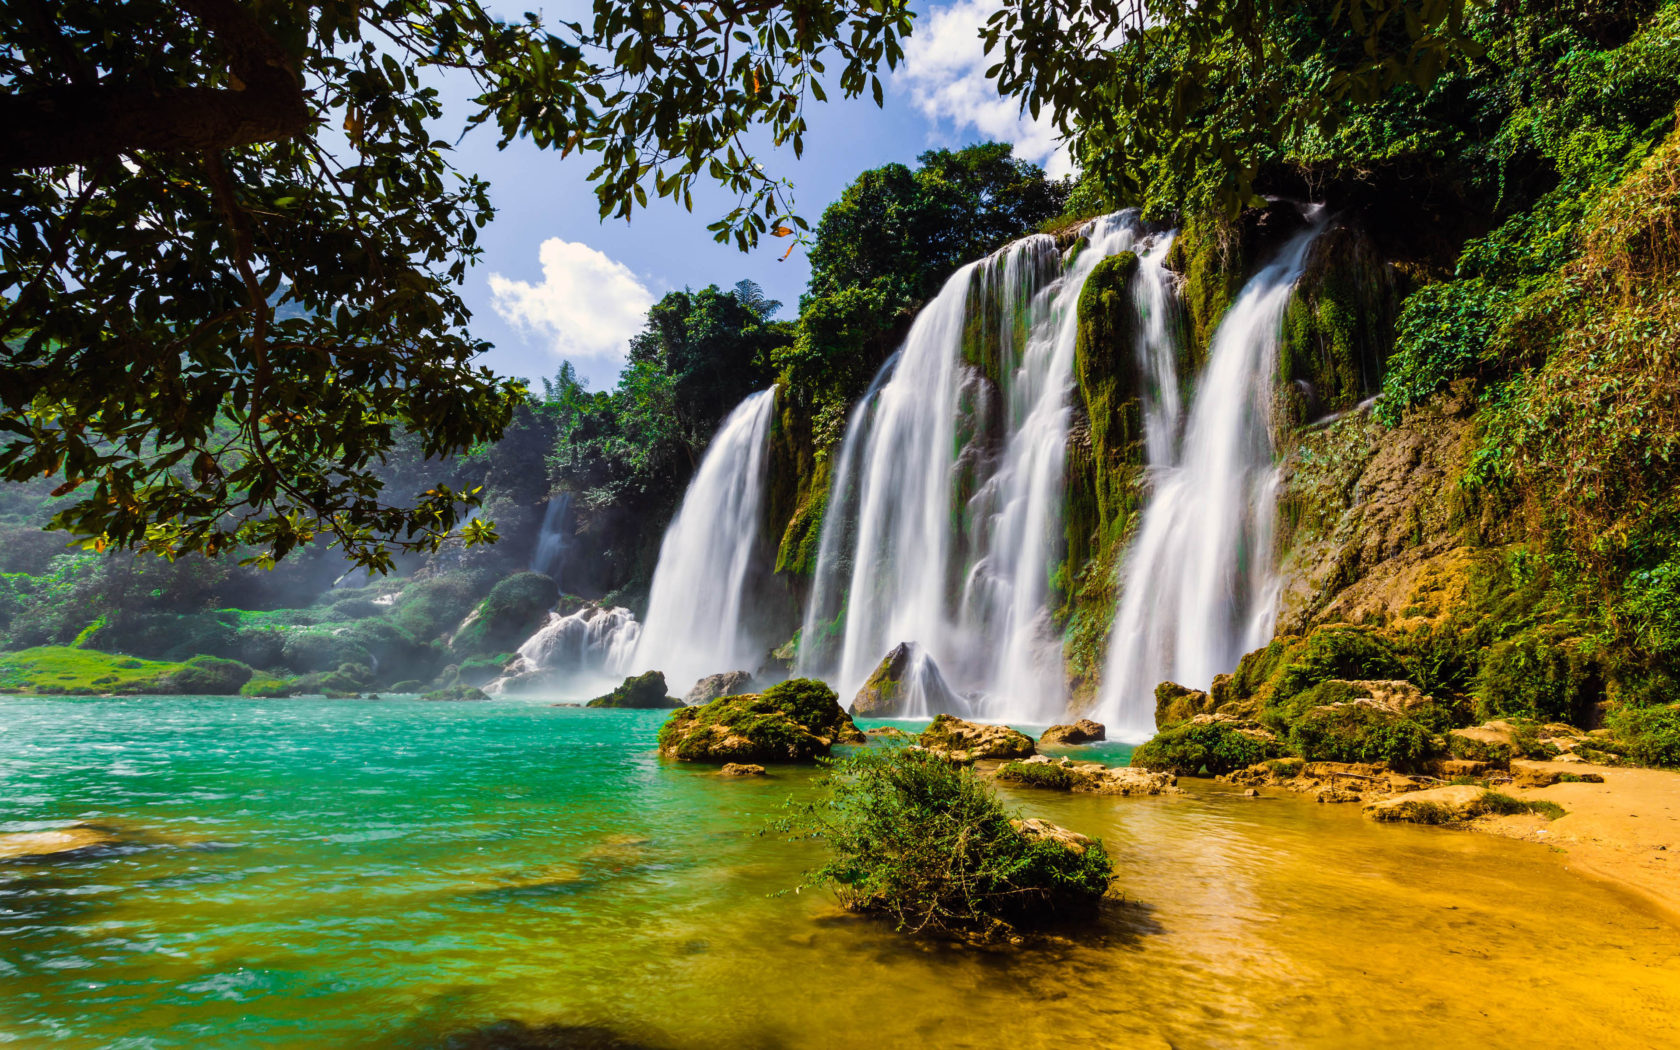 Iguazu Falls Wallpaper 1920x1200 Ban Gioc Waterfall In China And Vietnam 4k Wallpapers Hd